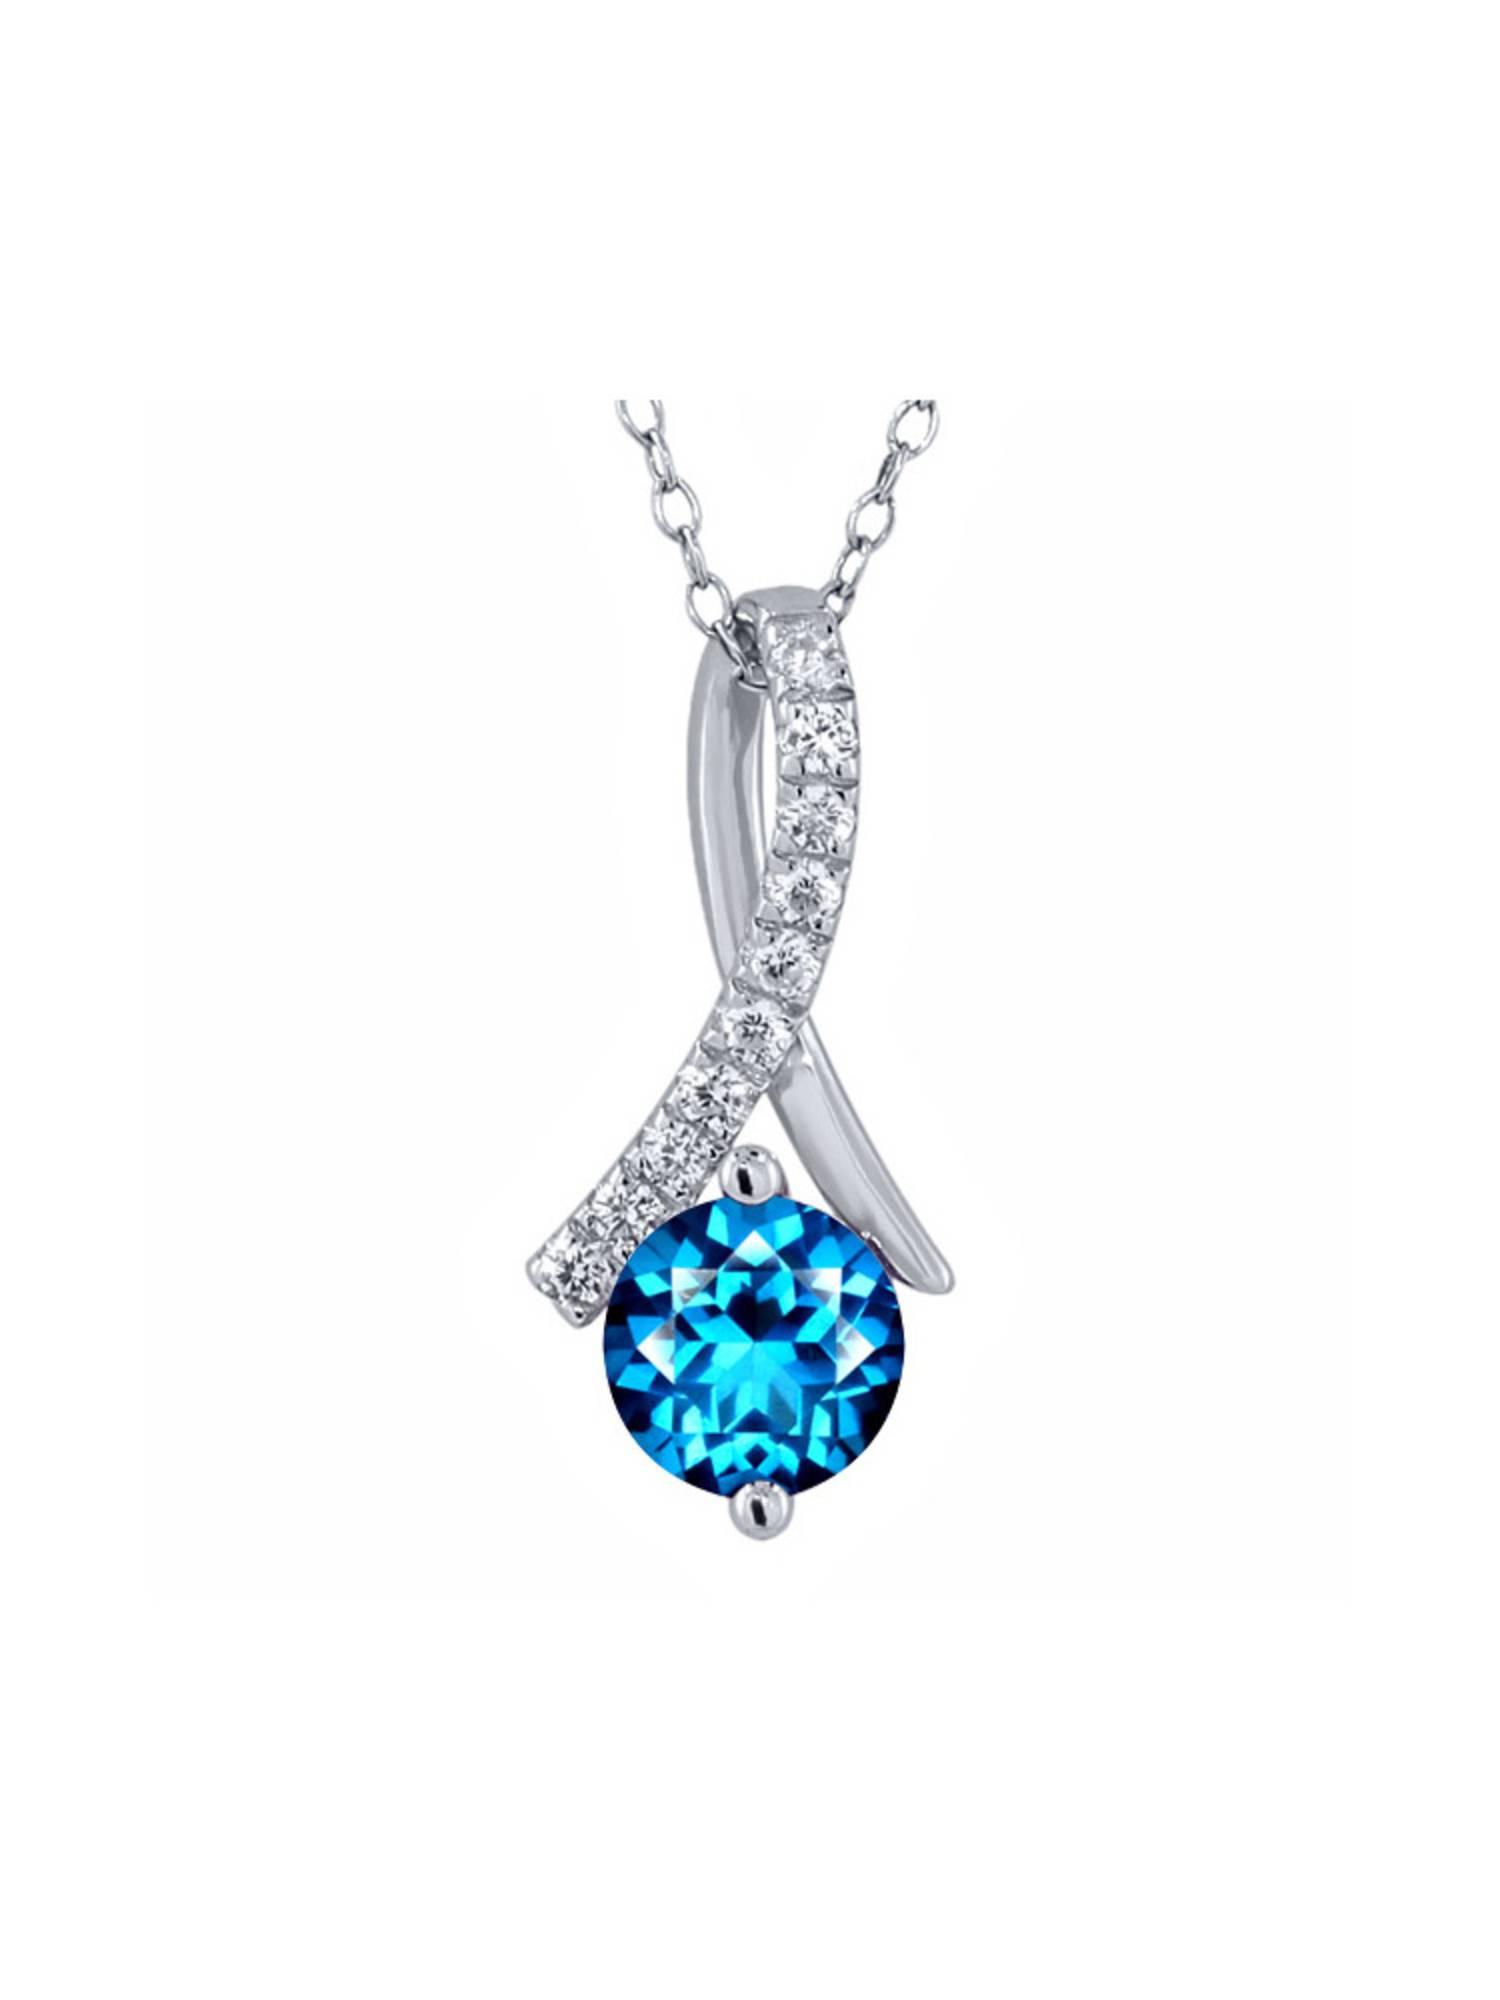 925 Sterling Silver Pendant Set with Round Kashmir Blue Topaz from Swarovski